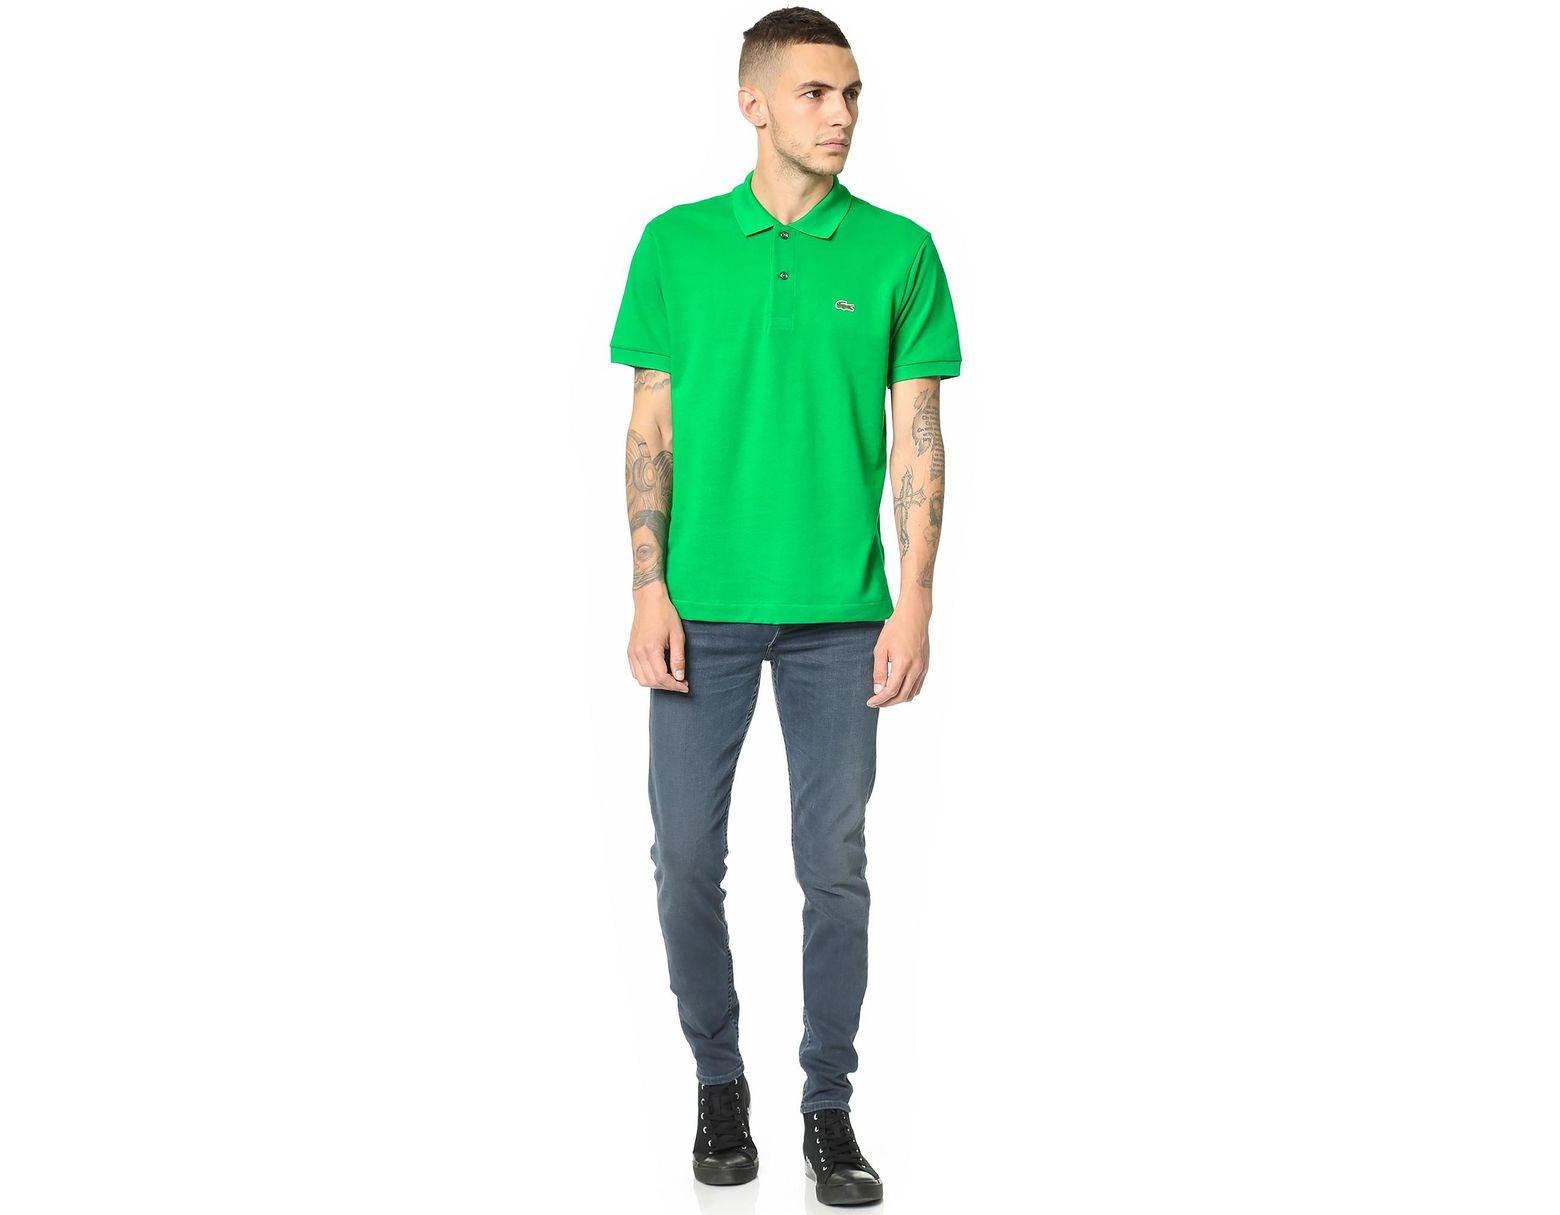 f3db03a9 Men's Green Short Sleeve Classic Pique Polo